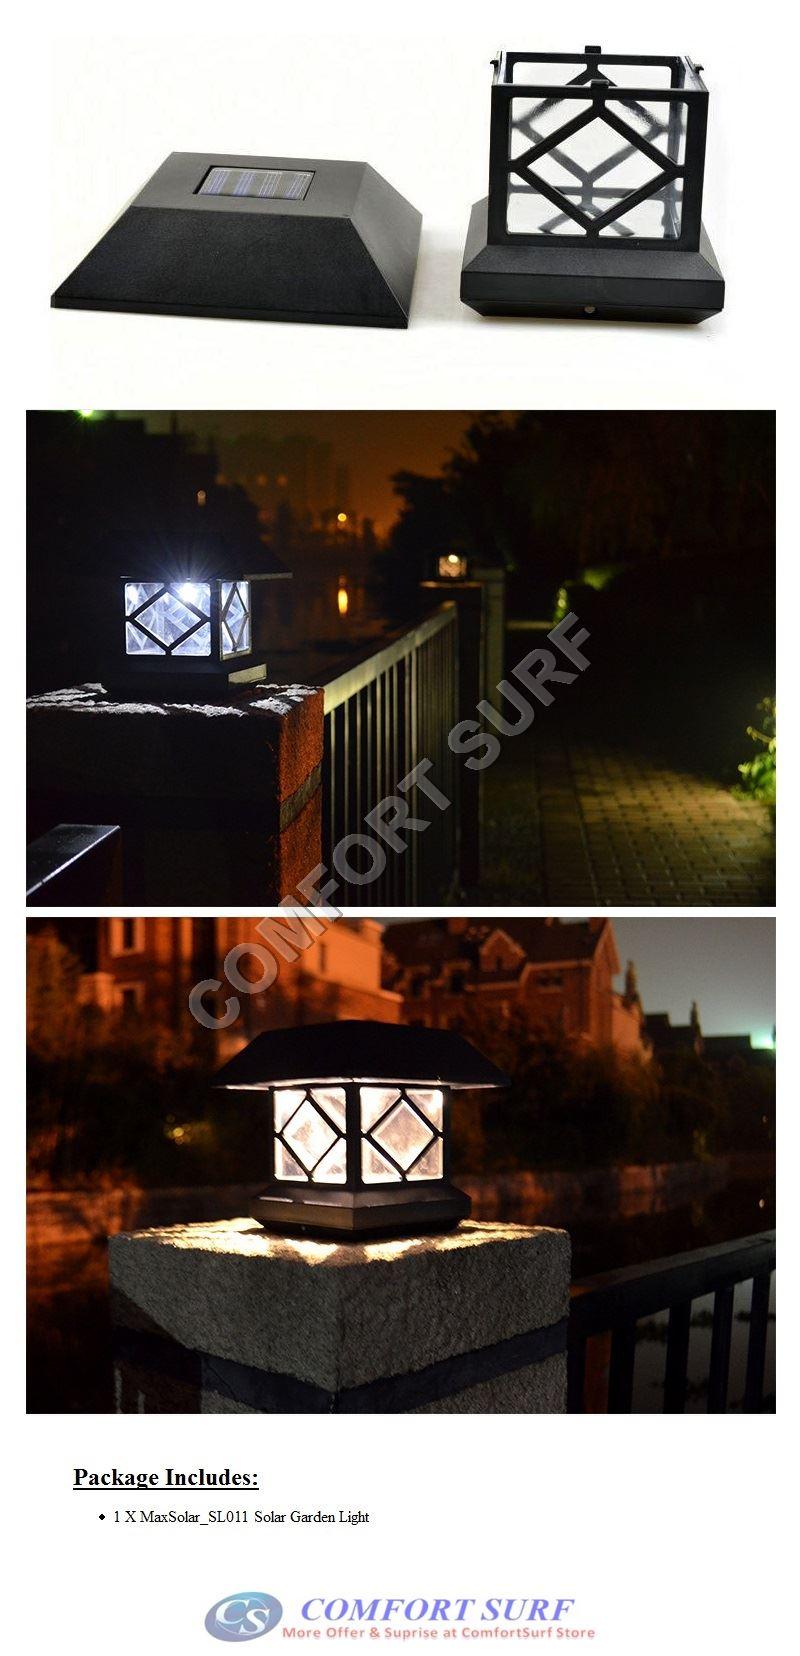 MaxSolar SL011 Outdoor Solar Powered LED Light Gate Pillar Way Landscape Garden Fence Decoration Lamp